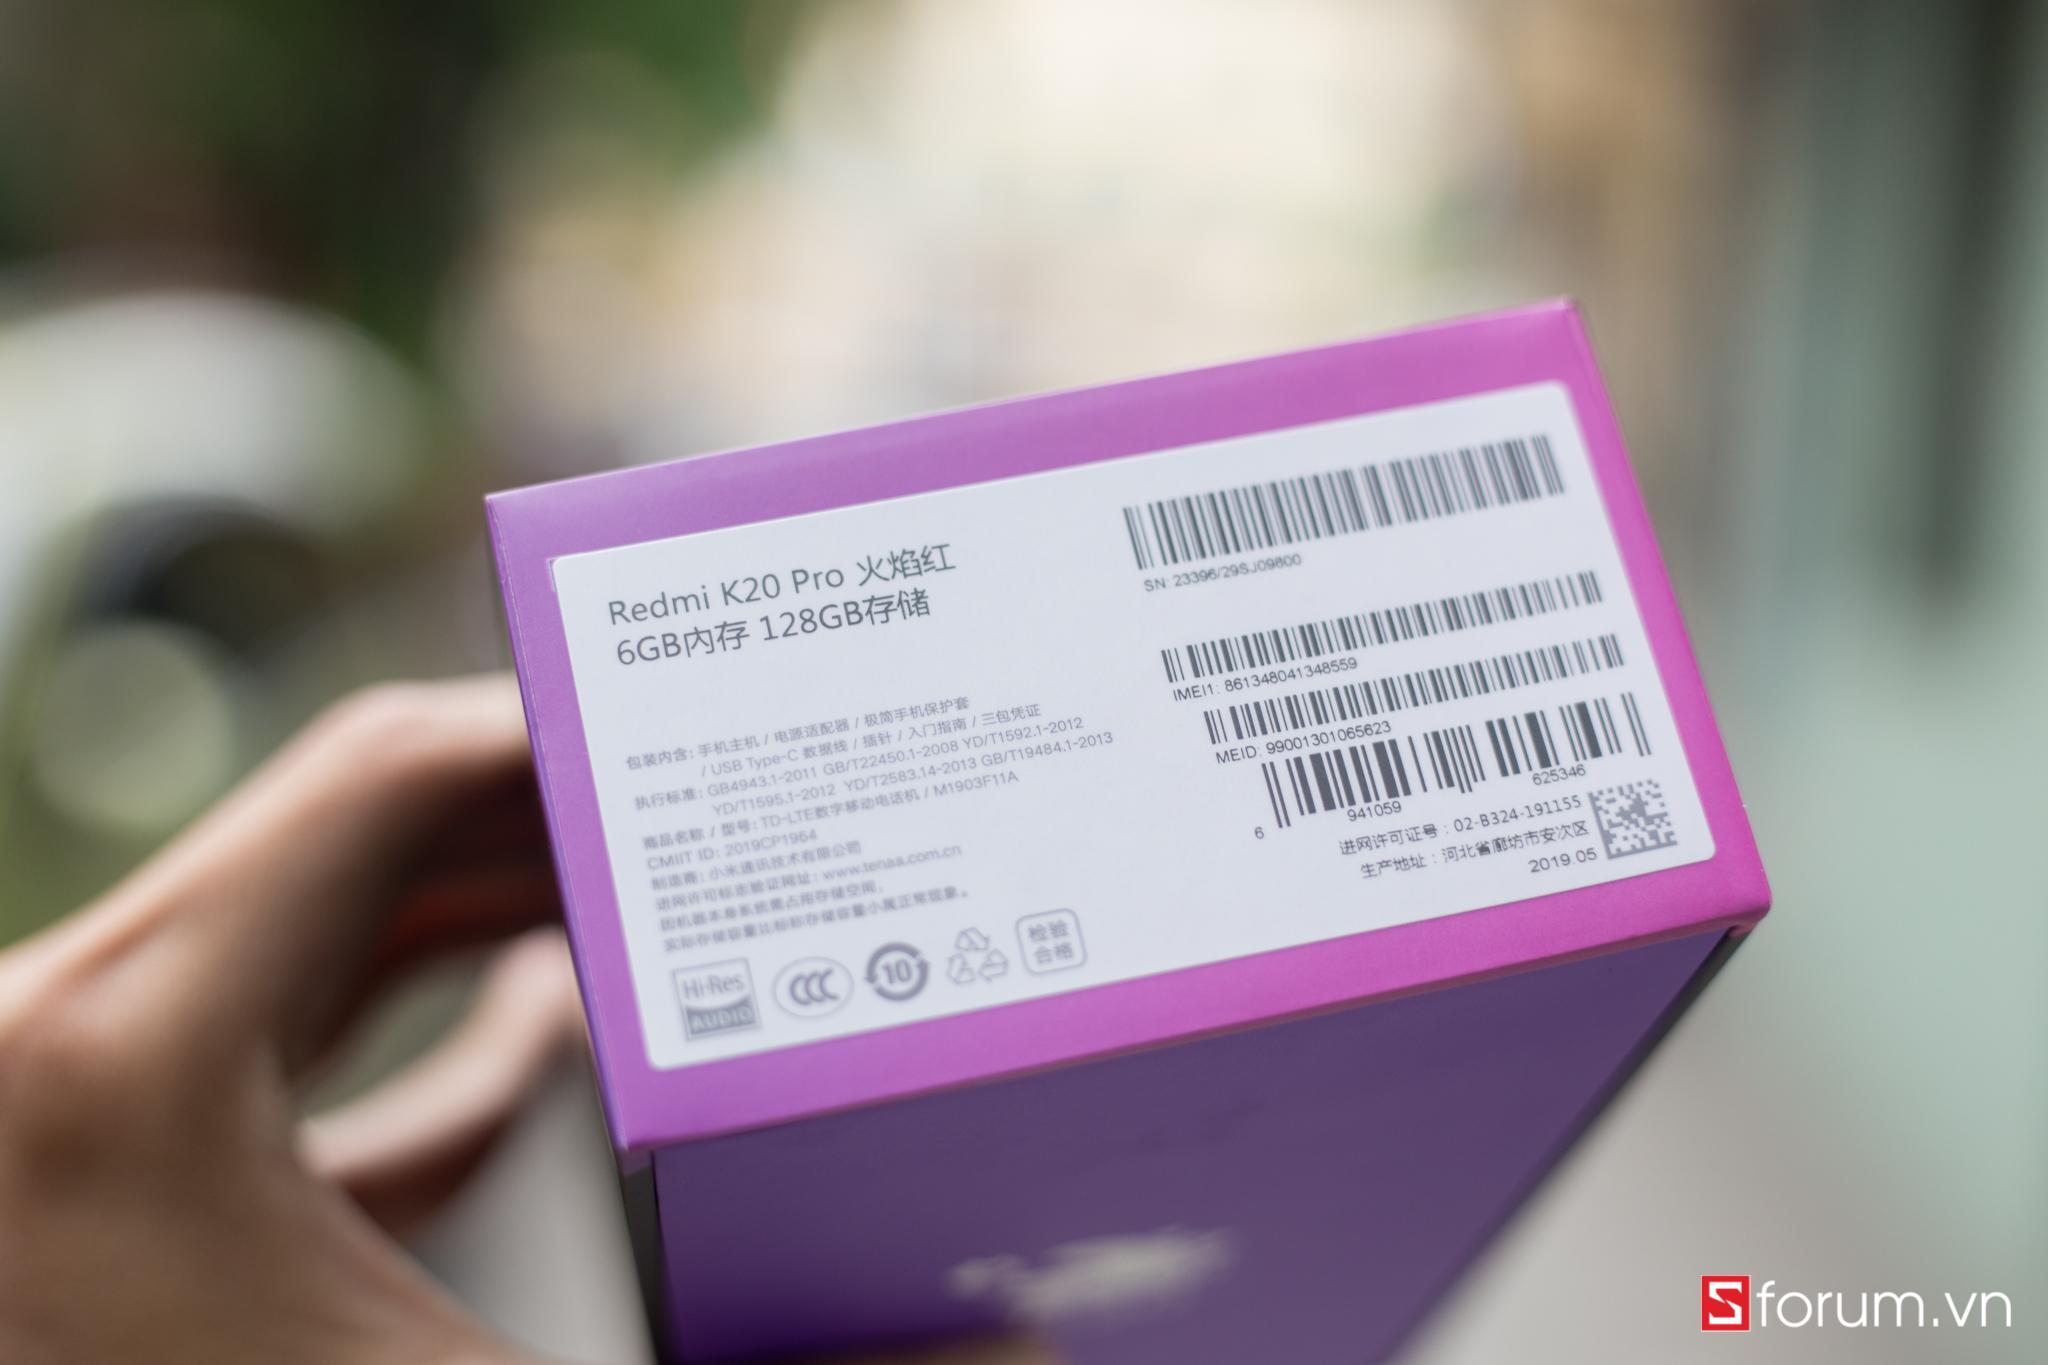 Sforum - Latest technology information untitled-3 On the first Redmi K20 Pro in Vietnam: